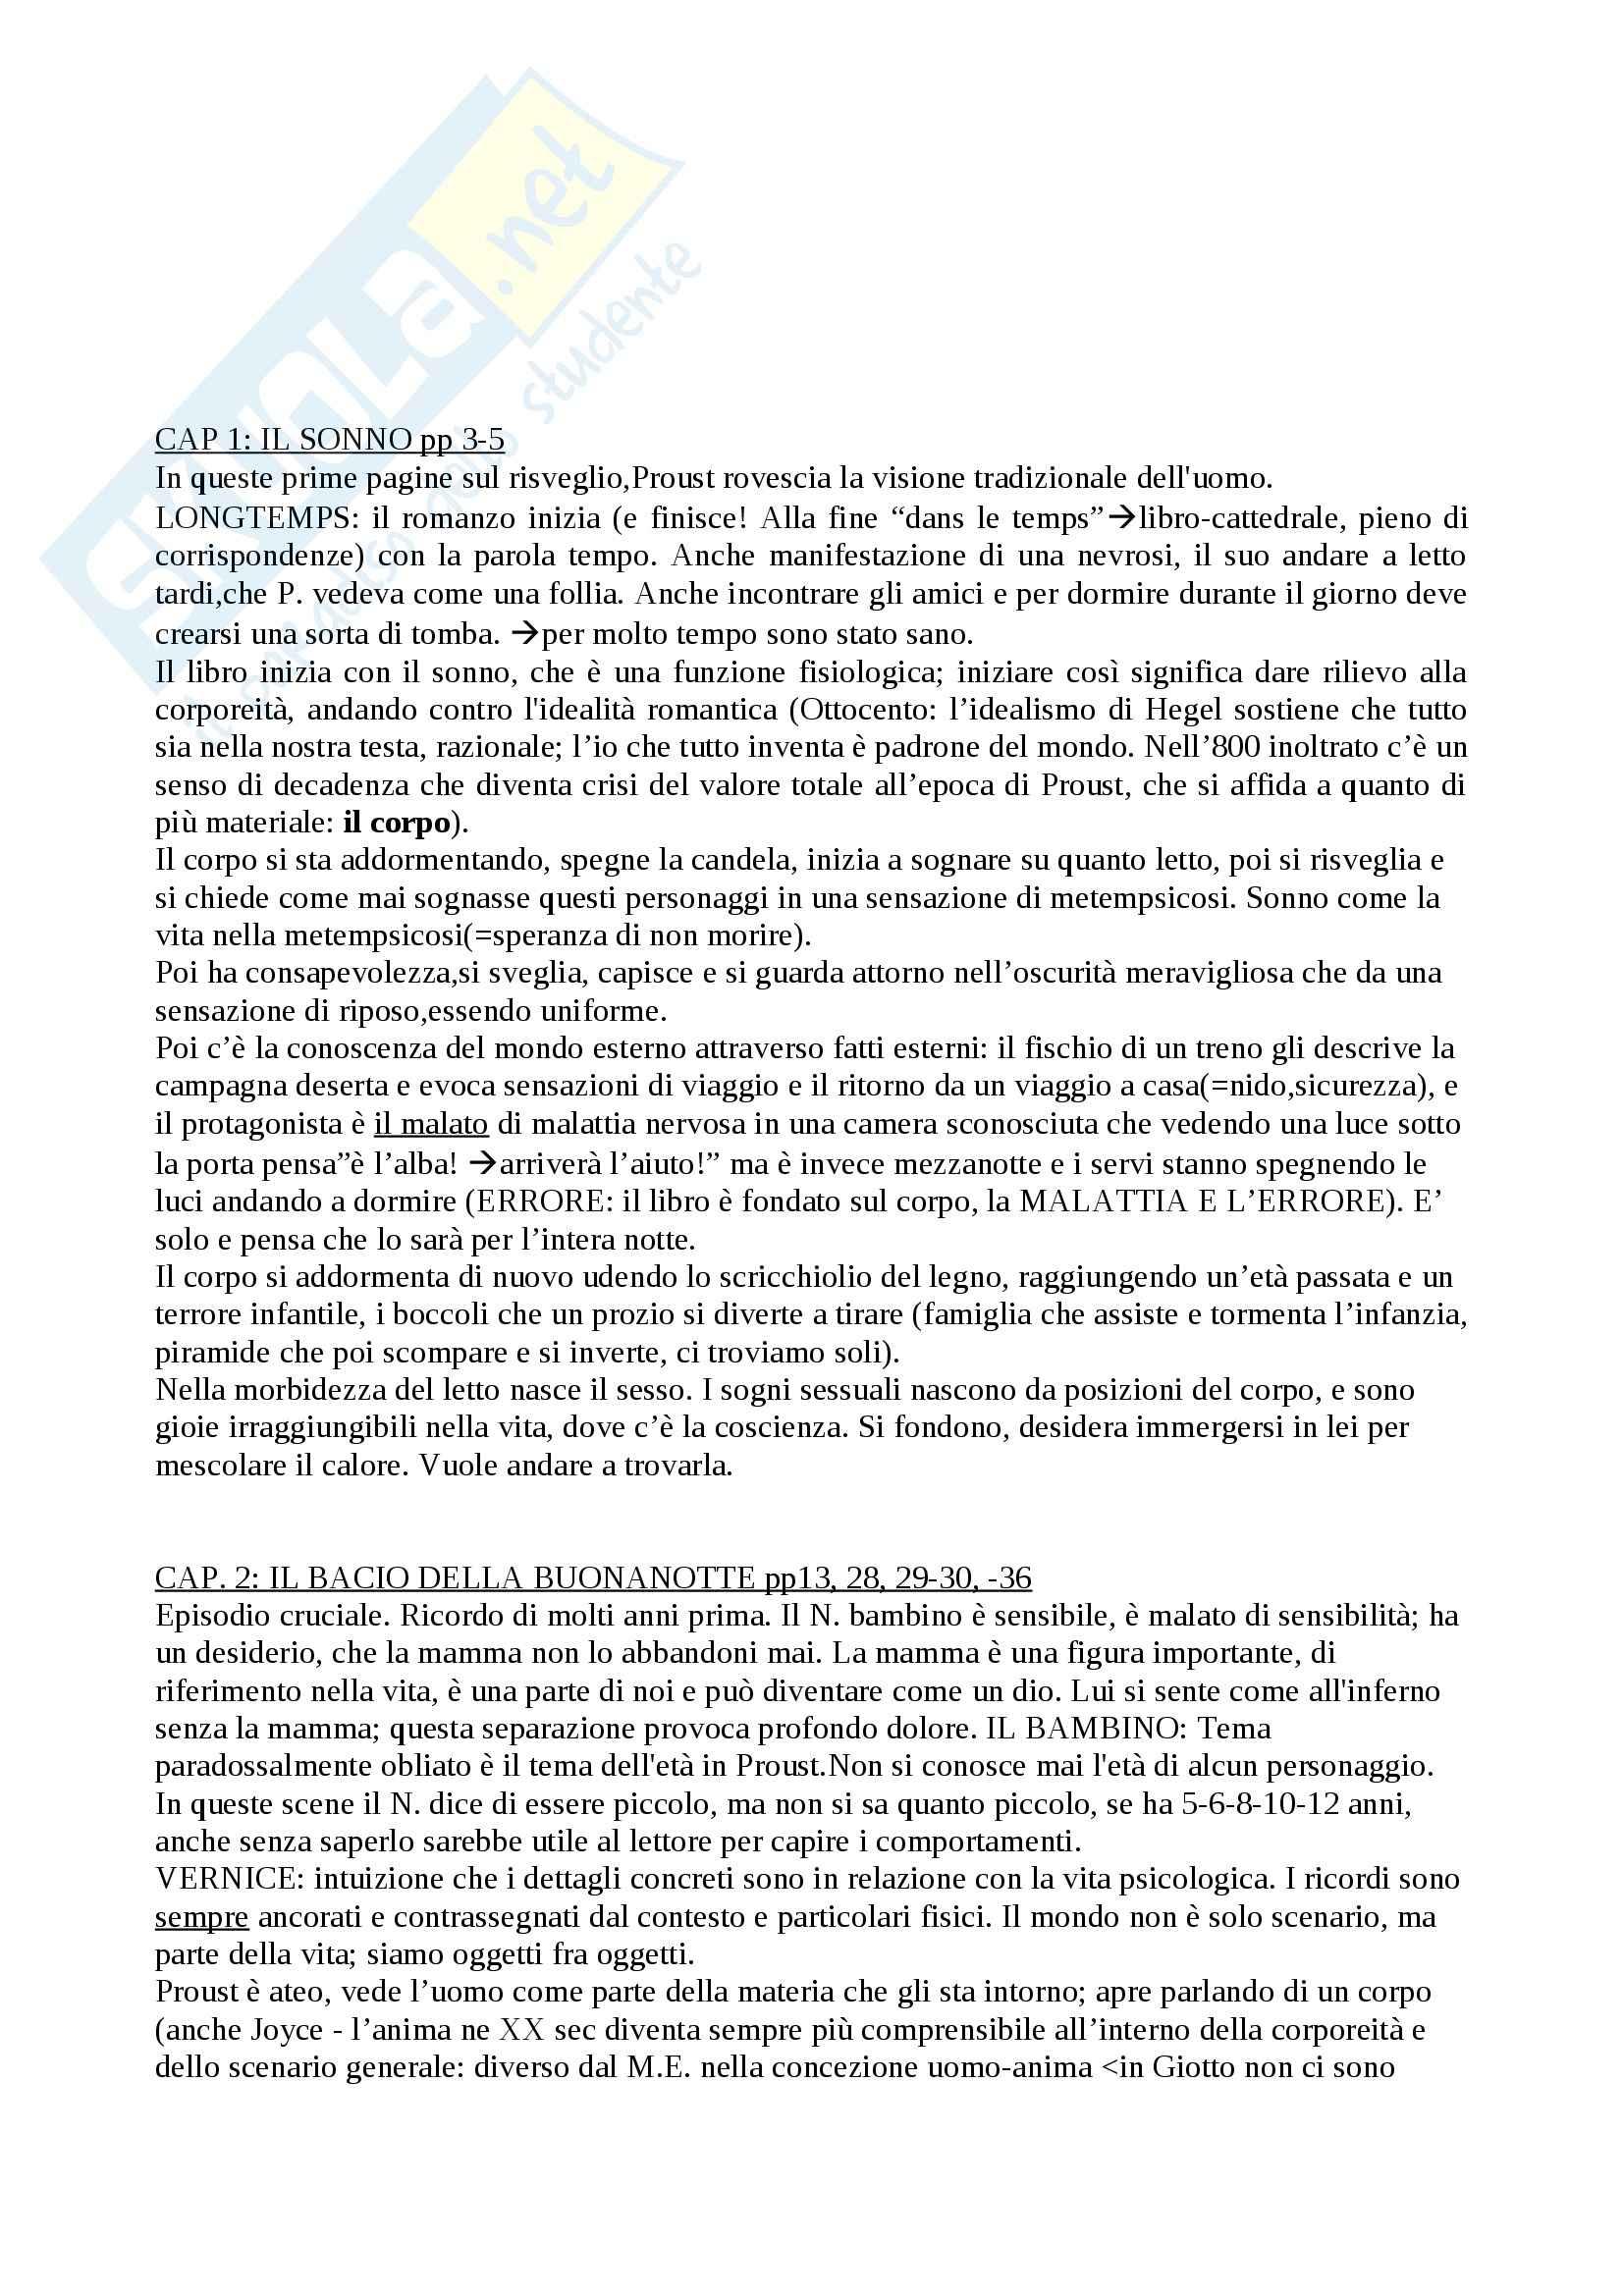 Opere di Proust, Letteratura francese Pag. 6